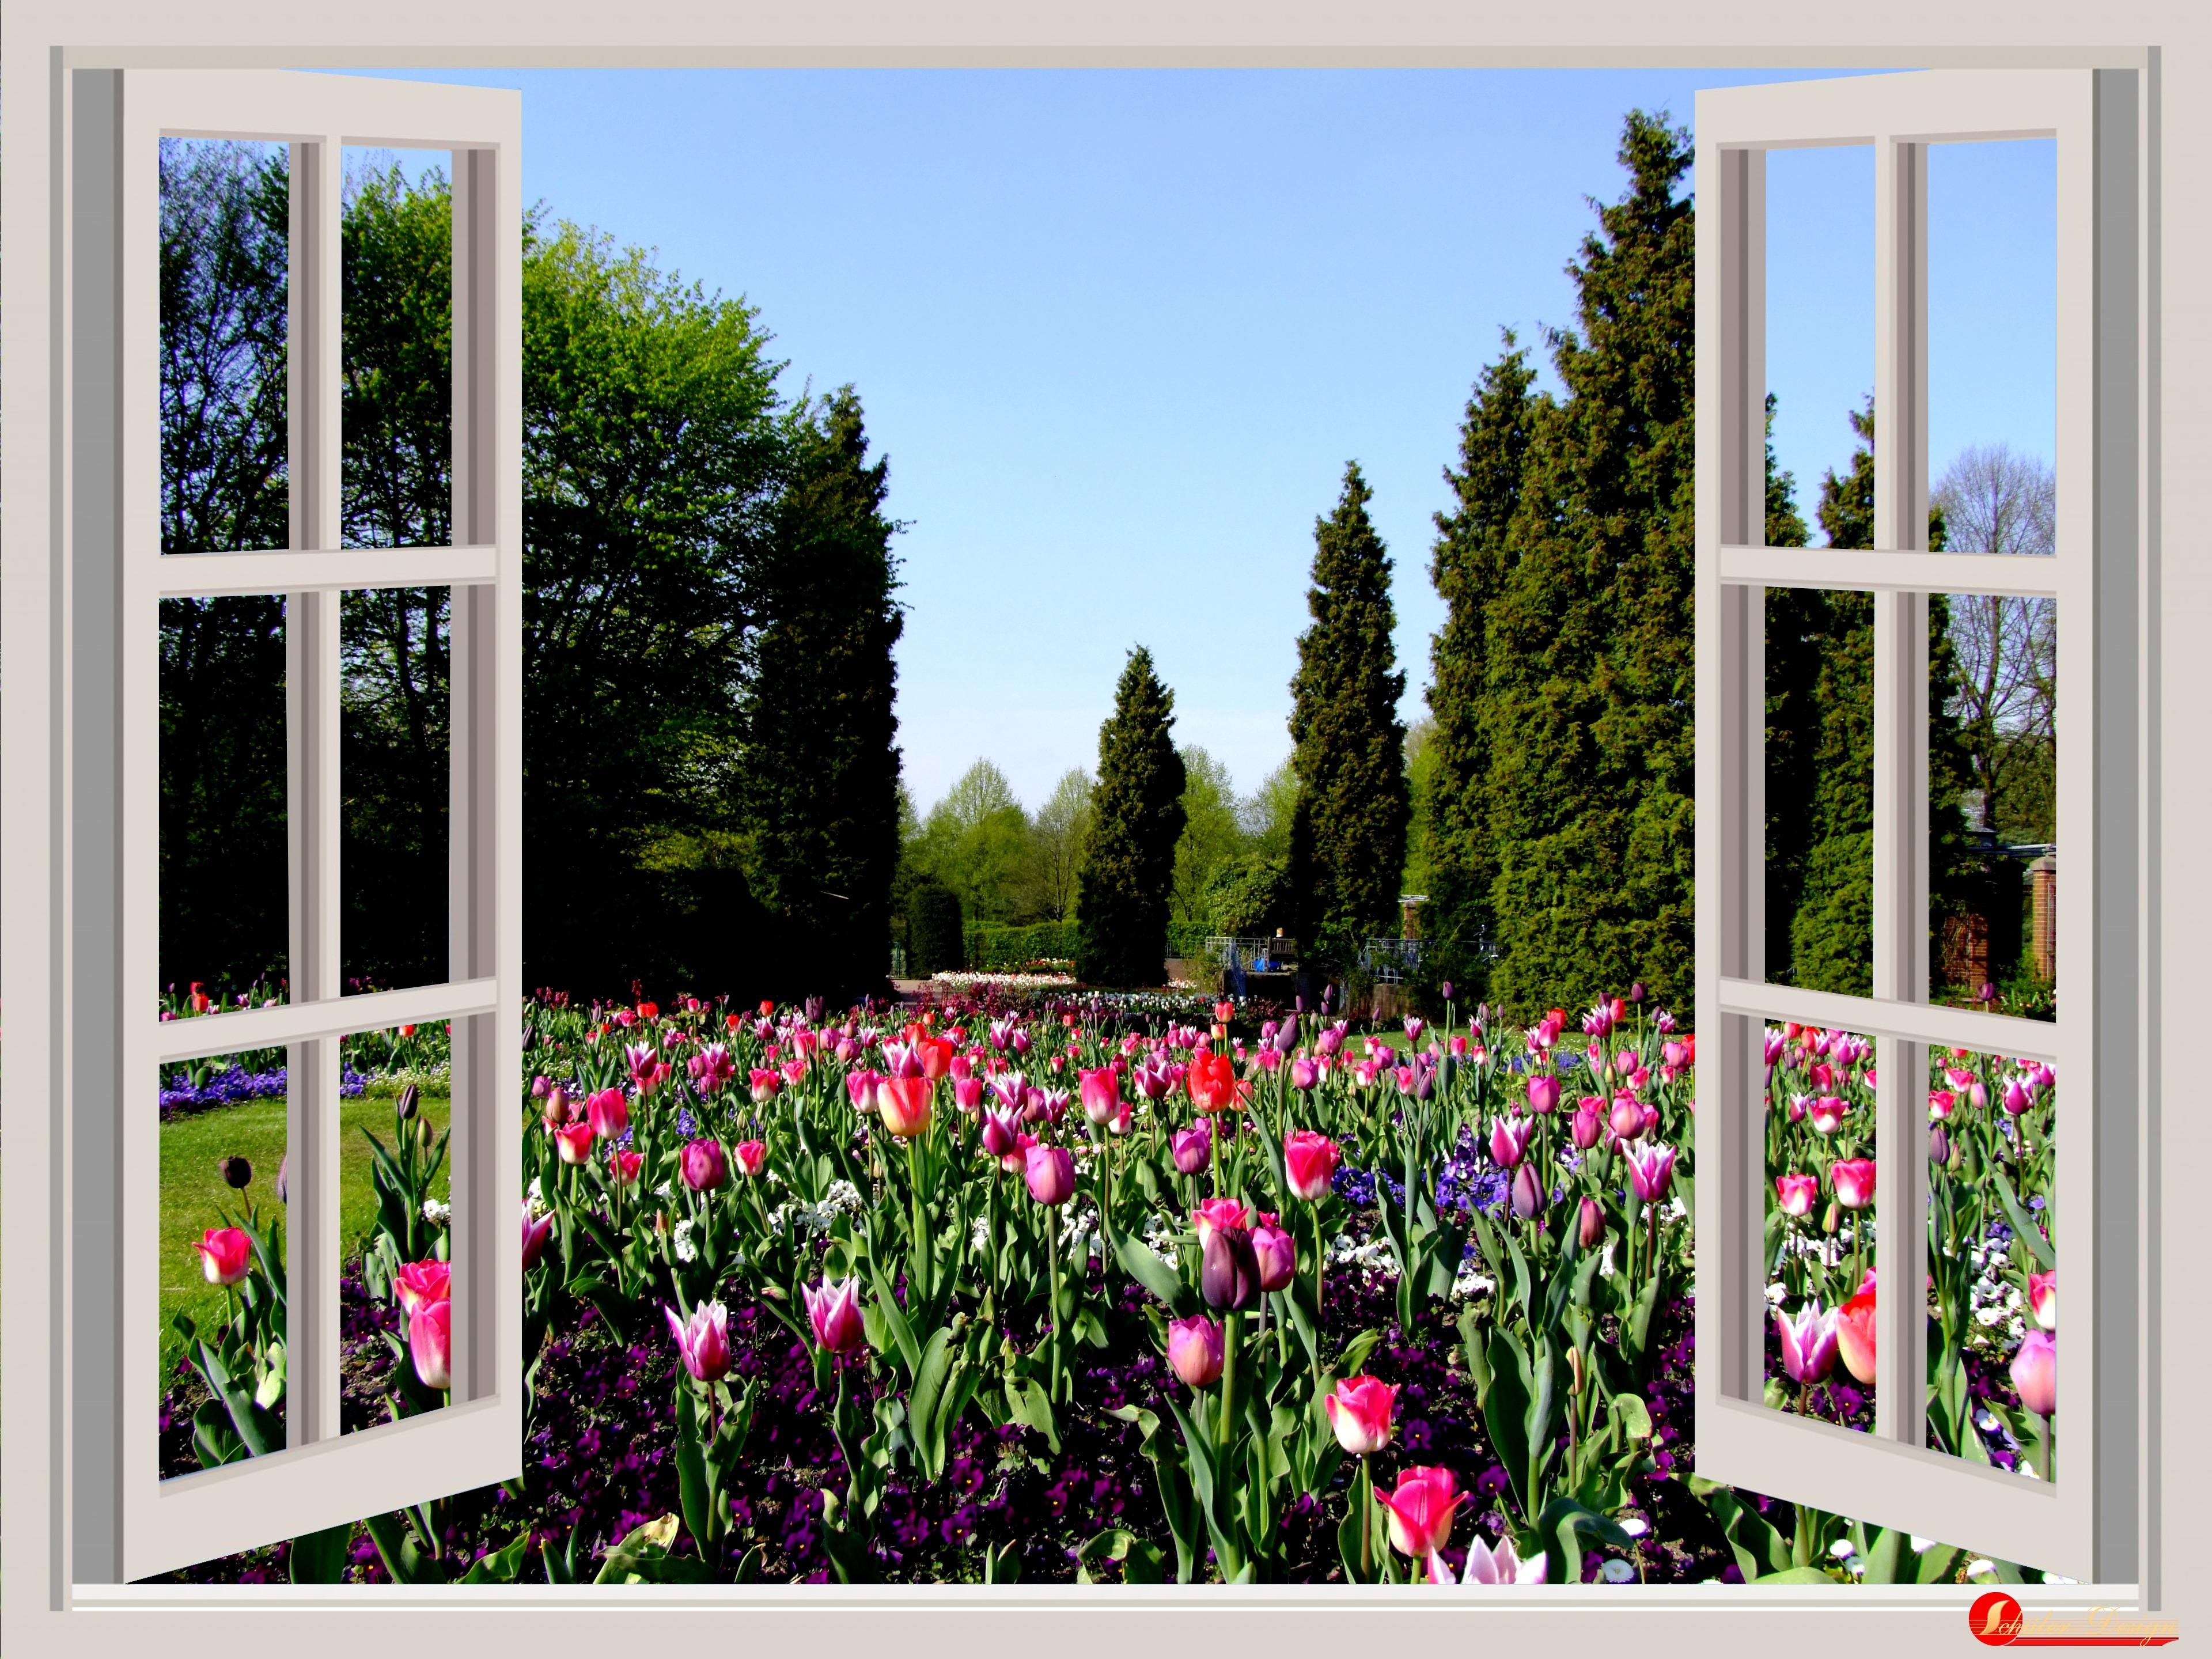 Unduh 410+ Gambar Hamparan Bunga Tulip HD Terbaik